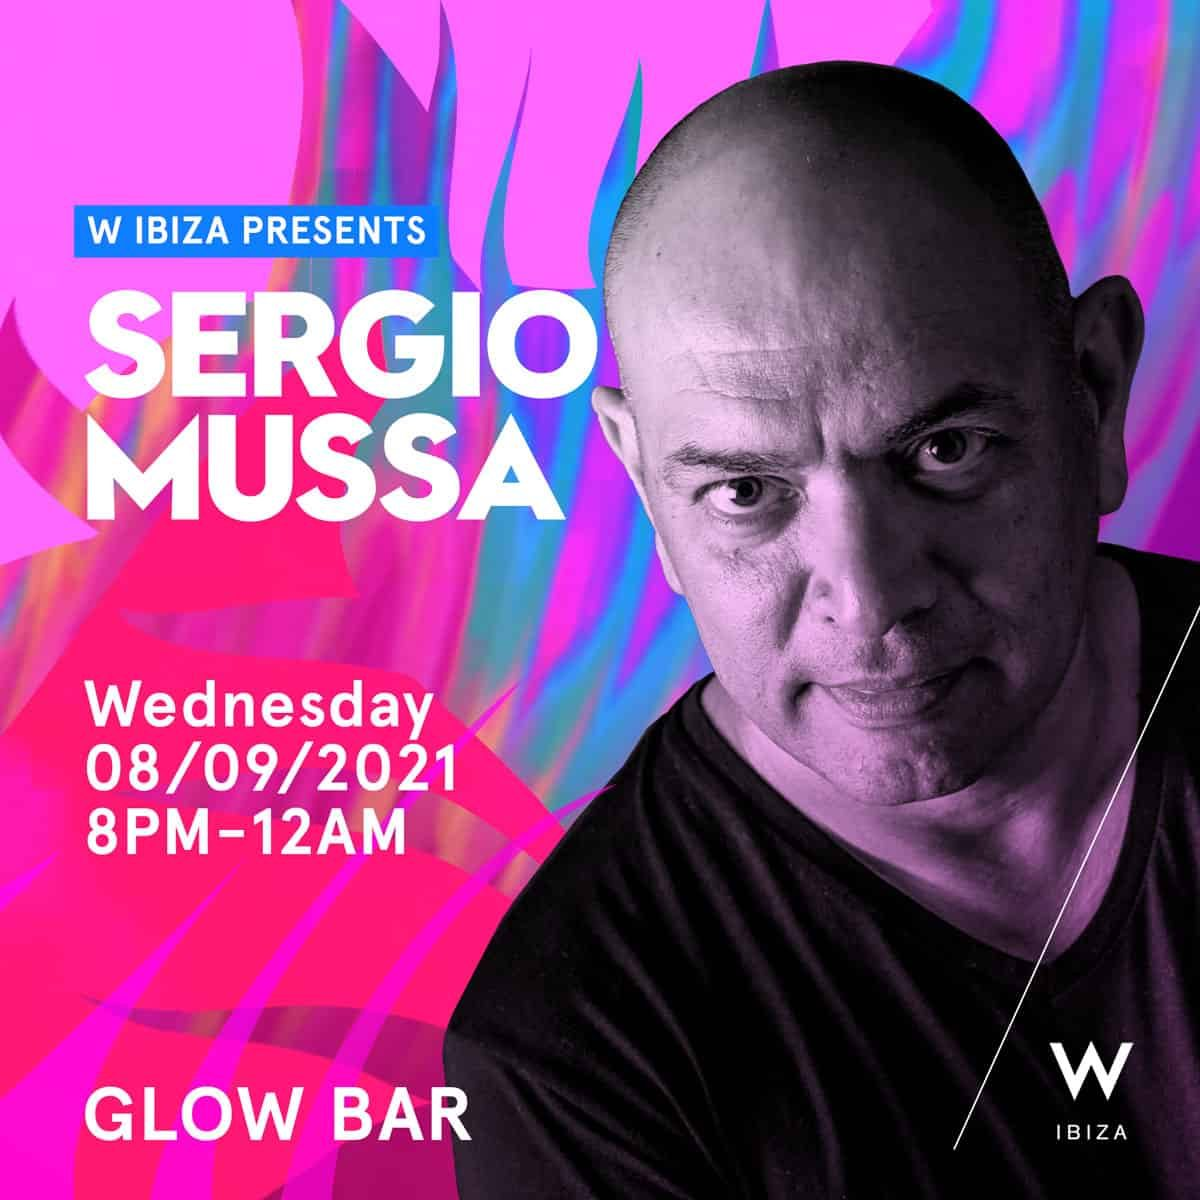 sergio-mussa-w-ibiza-hotel-2021-welcometoibiza